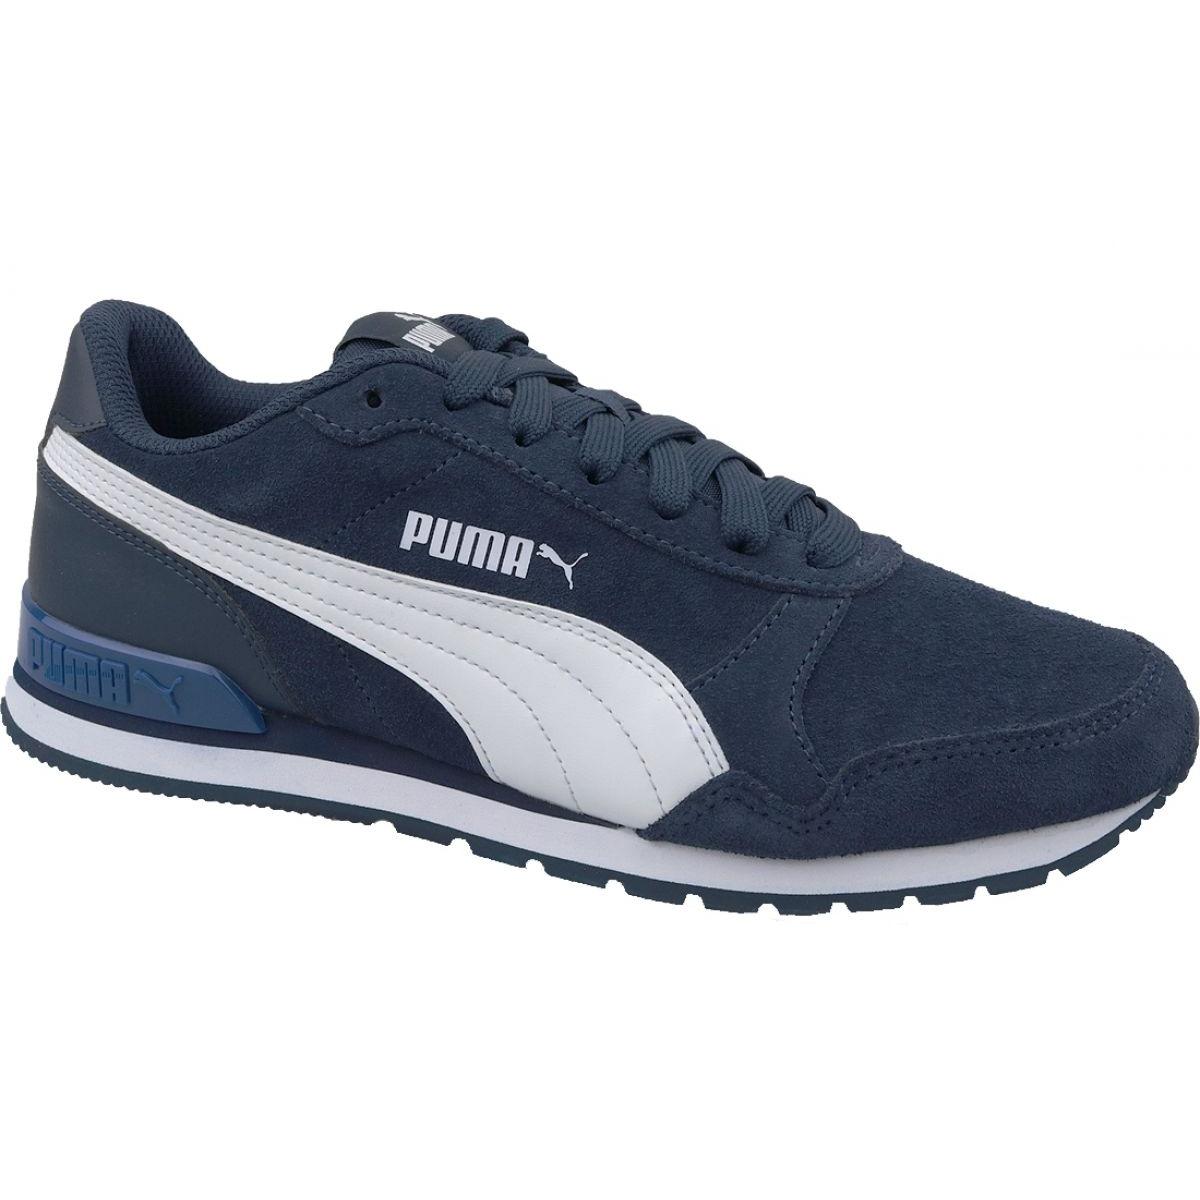 puma st runner sd sneakers unisex